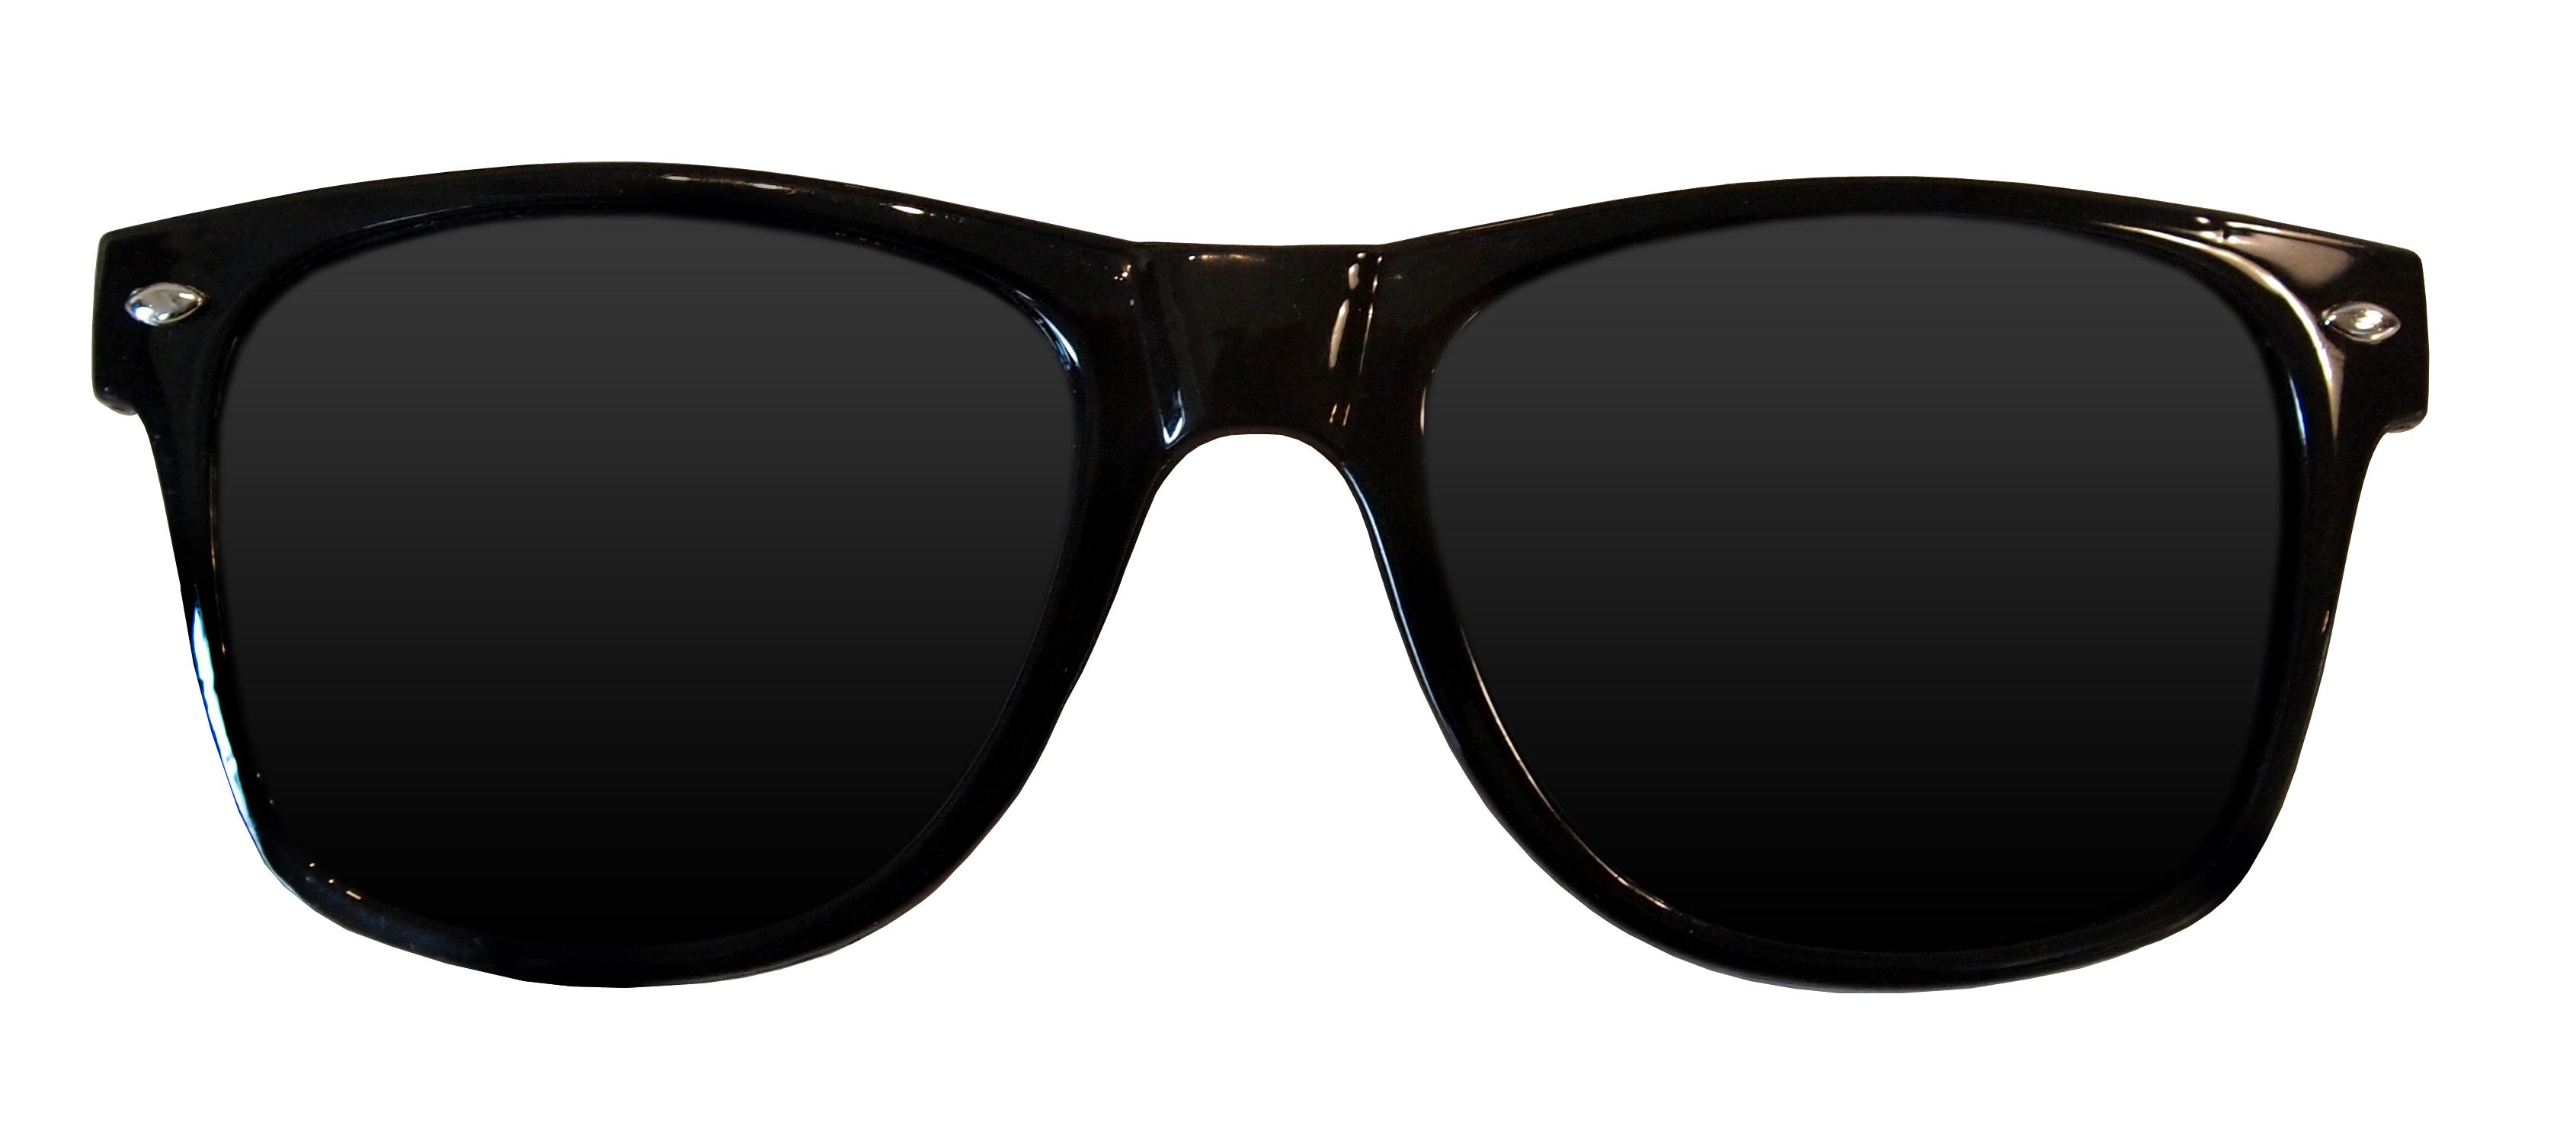 Real glasses clipart clipart transparent Sunglass PNG Transparent Sunglass.PNG Images. | PlusPNG clipart transparent